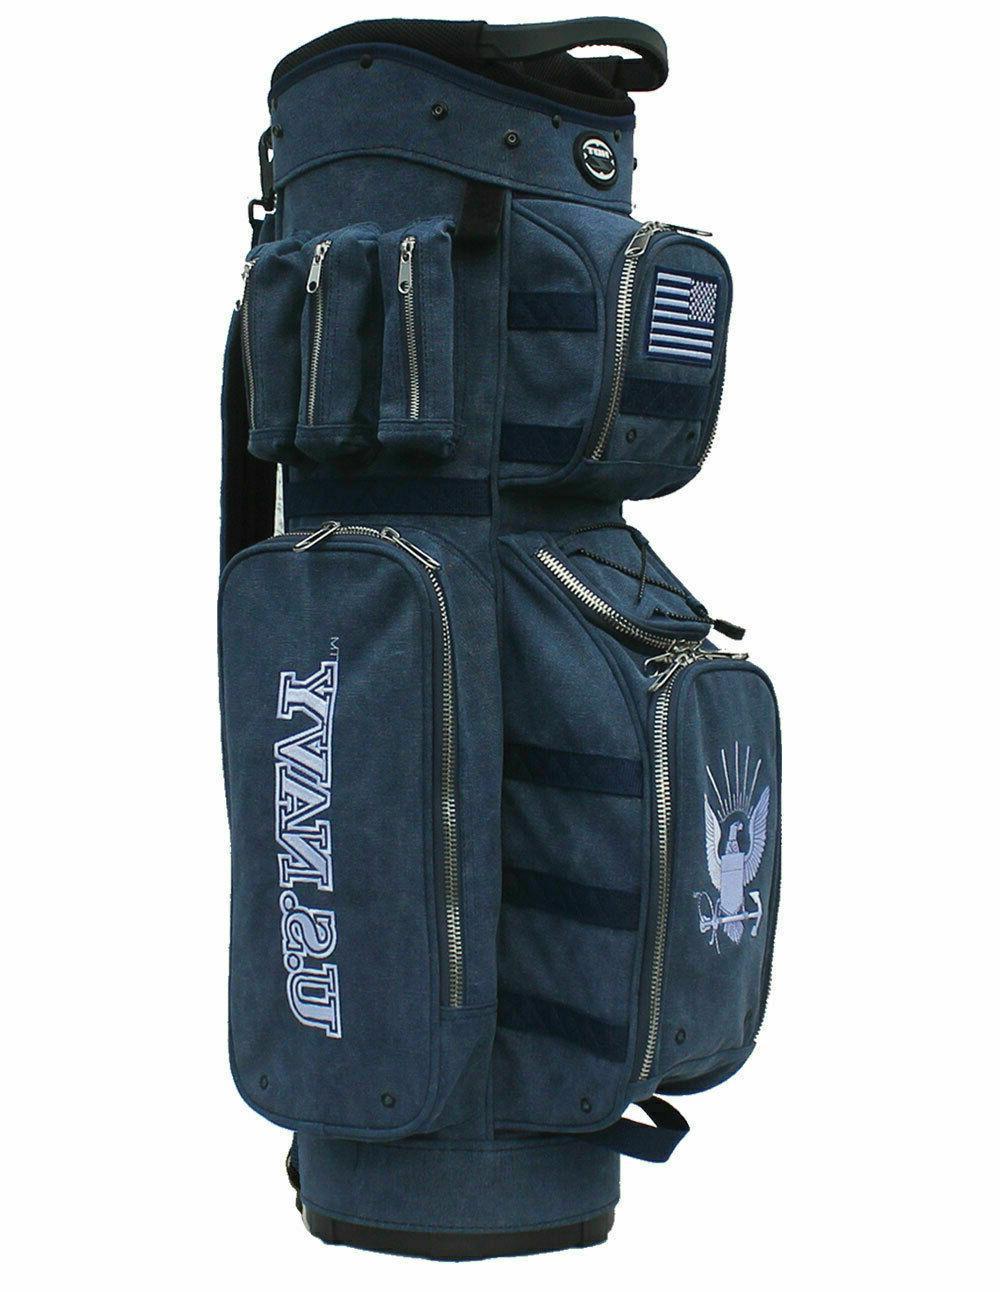 active duty cart bag navy